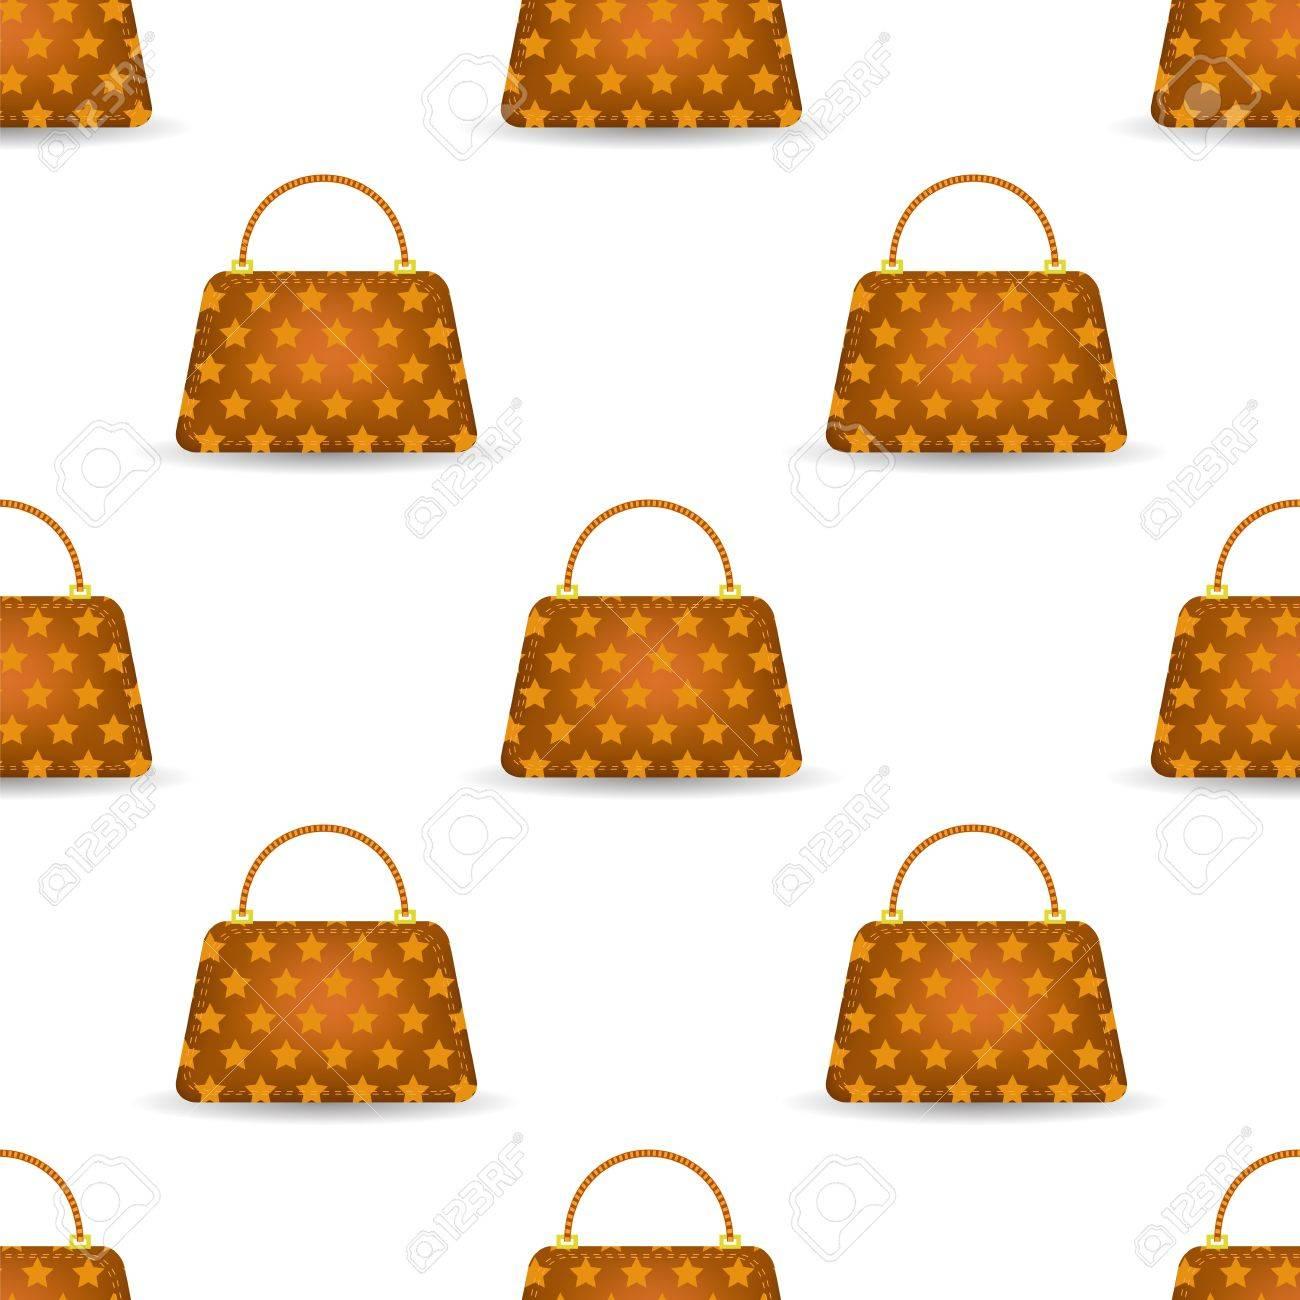 6bbfc6f69 Foto de archivo - Patrón sin fisuras para mujer del bolso naranja sobre  fondo blanco.